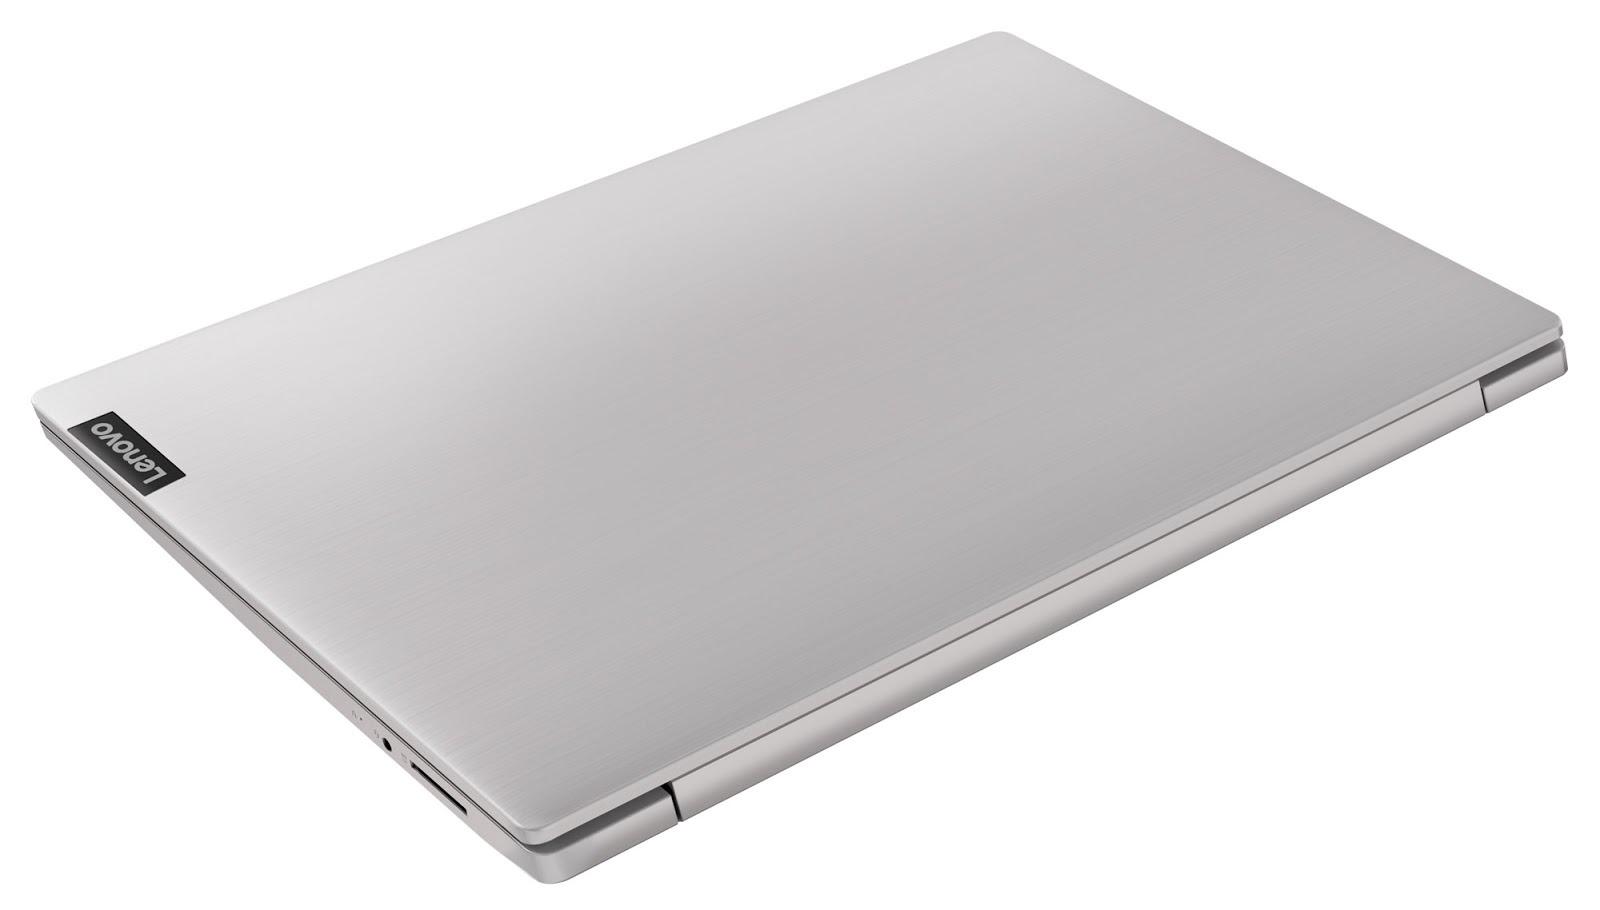 Фото 3. Ноутбук Lenovo ideapad S145-15IGM Grey (81MX001JRE)